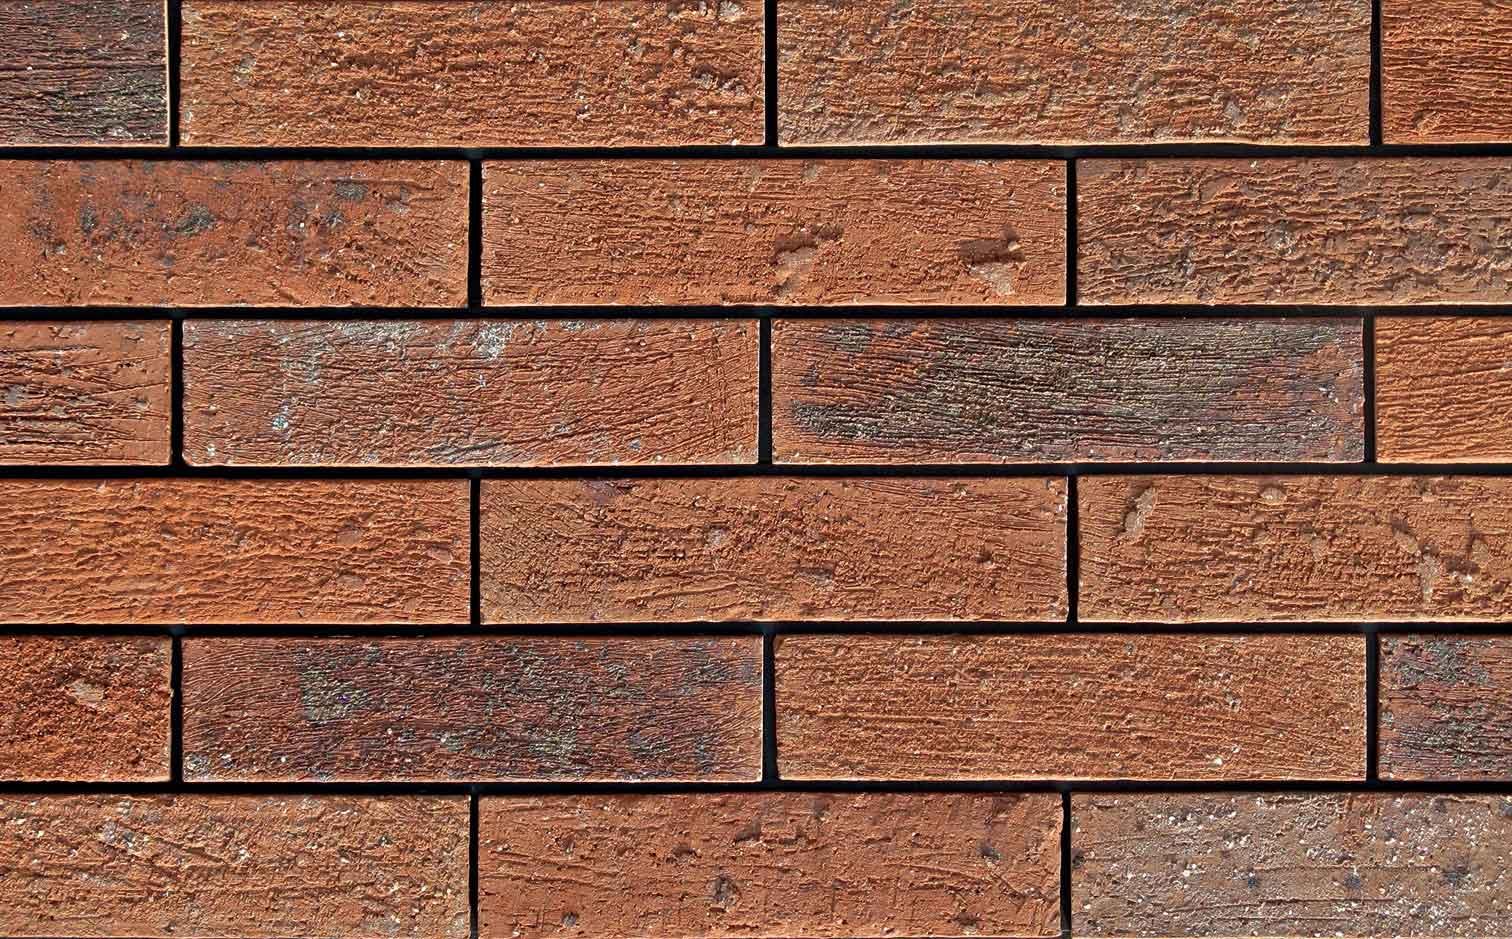 Supply Rough Crusted Handmade Split Brick Wall Rough Crusted Handmade Split Brick Wall Suppliers